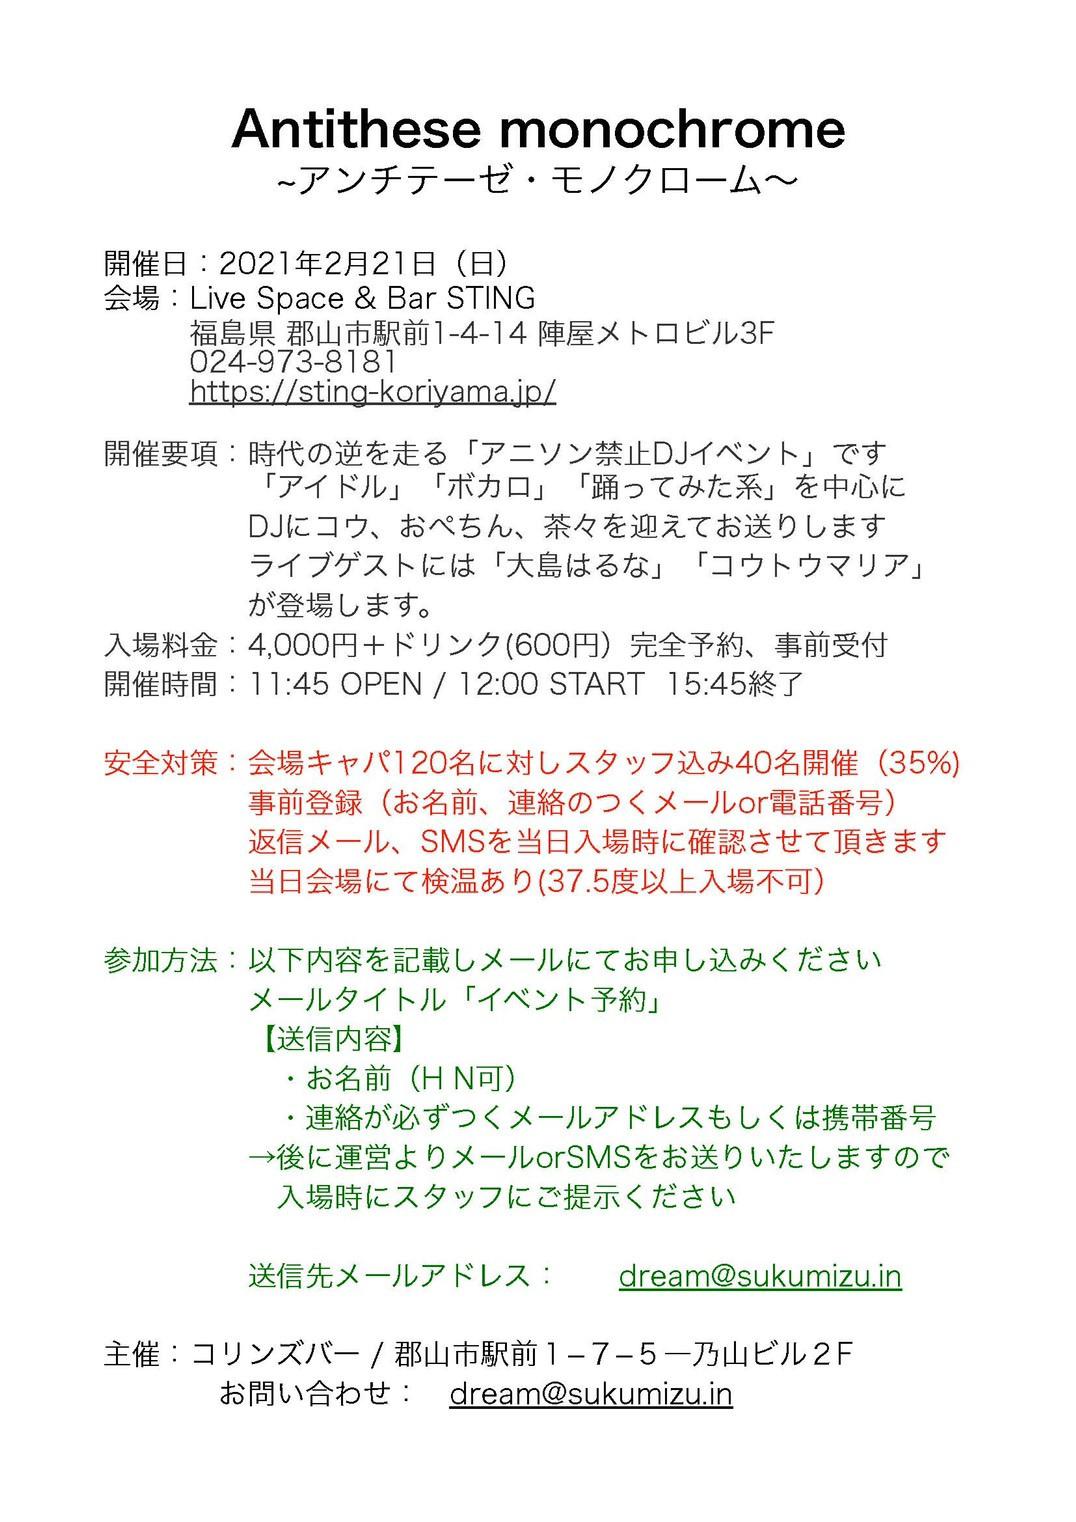 Antithese monochrome 〜アンチテーゼ・モノクローム〜